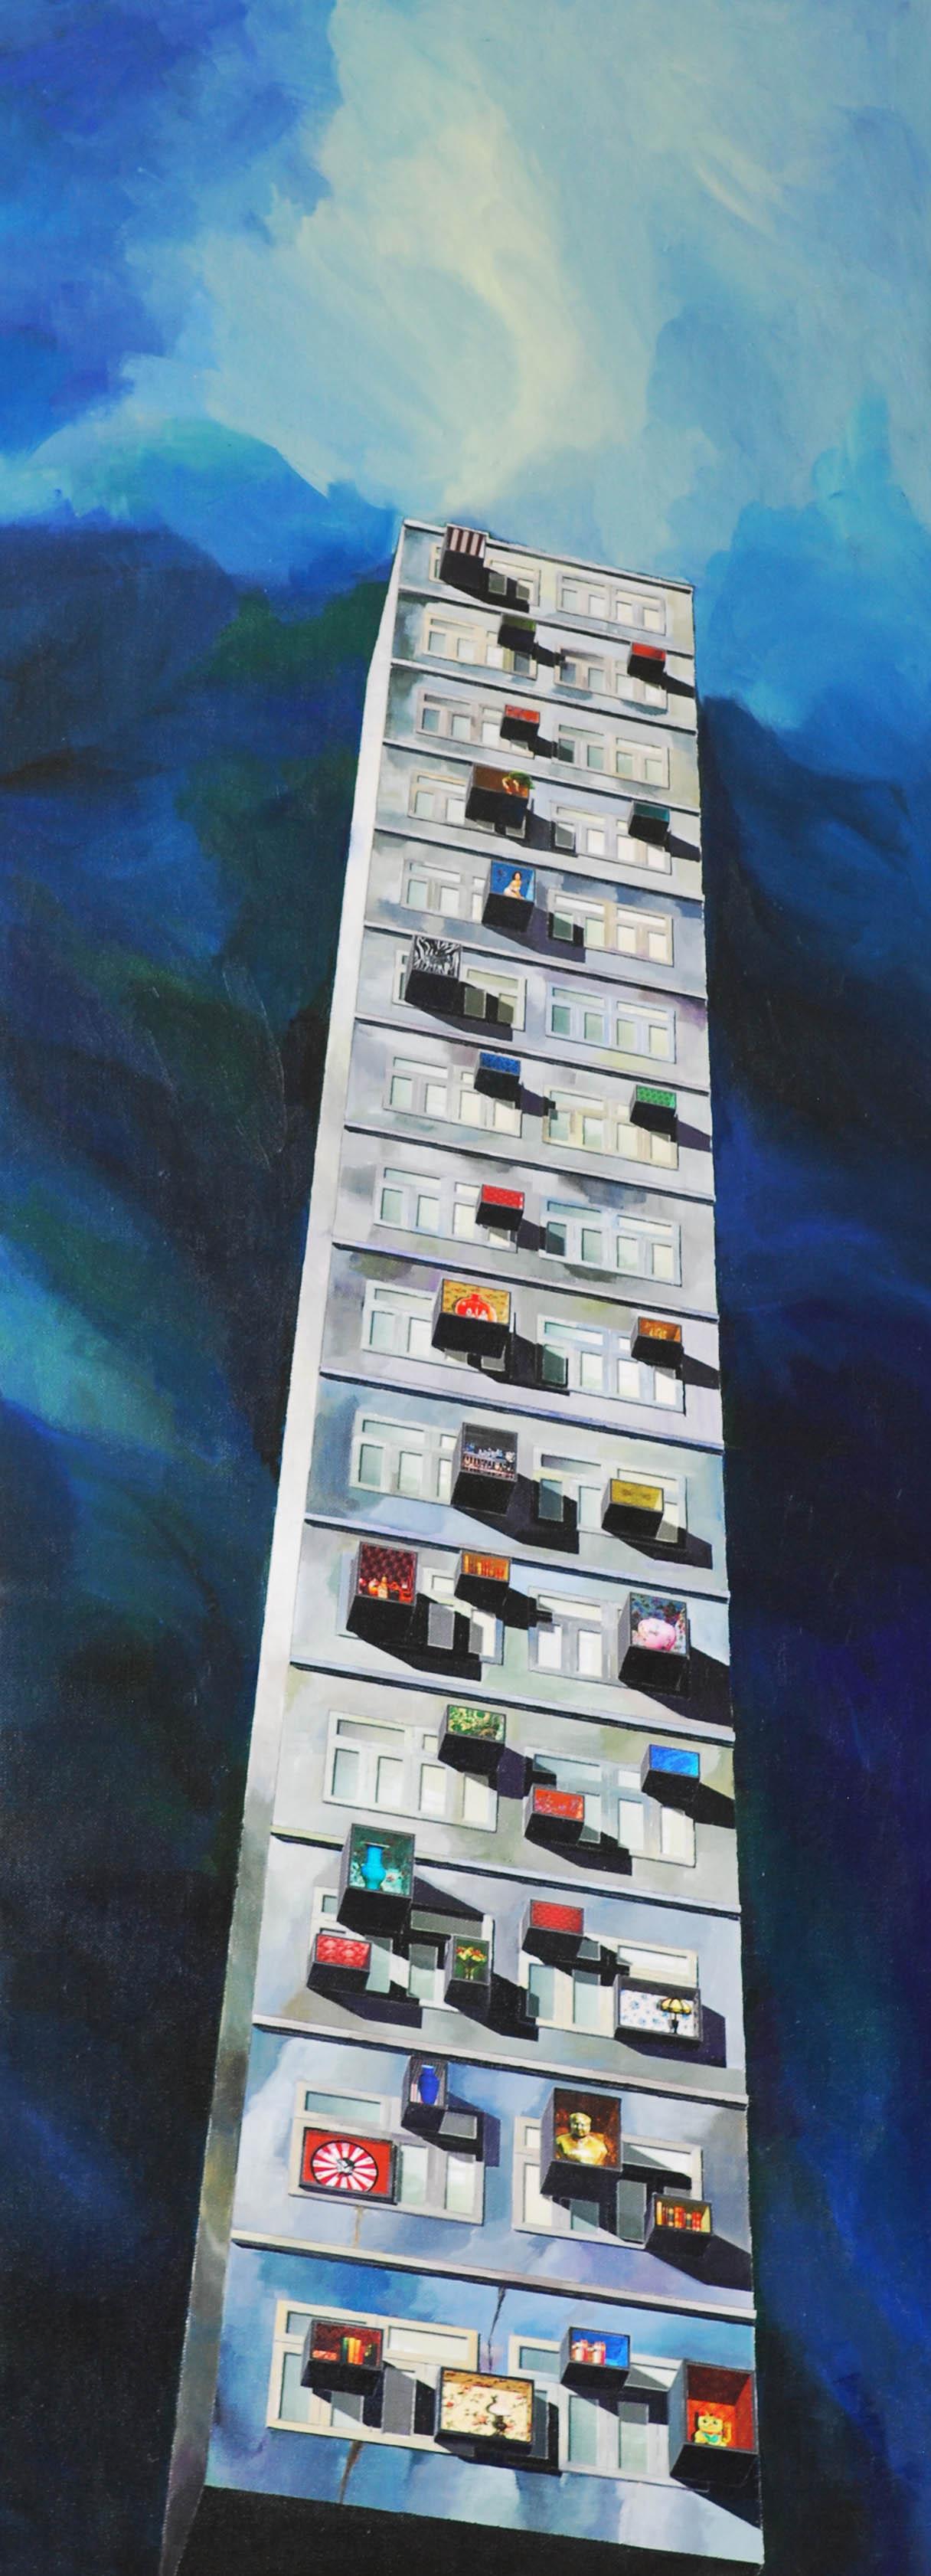 Outdoor Shelves - 2014 (SOLD)